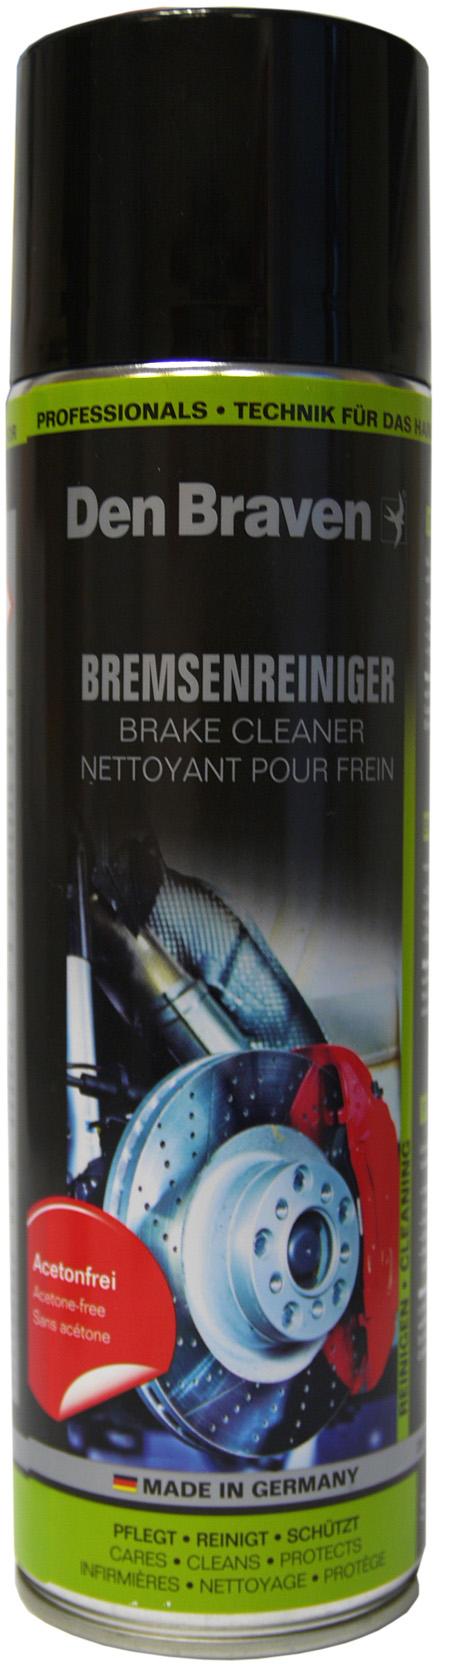 00713 - DenBraven Bremsenreiniger 500 ml